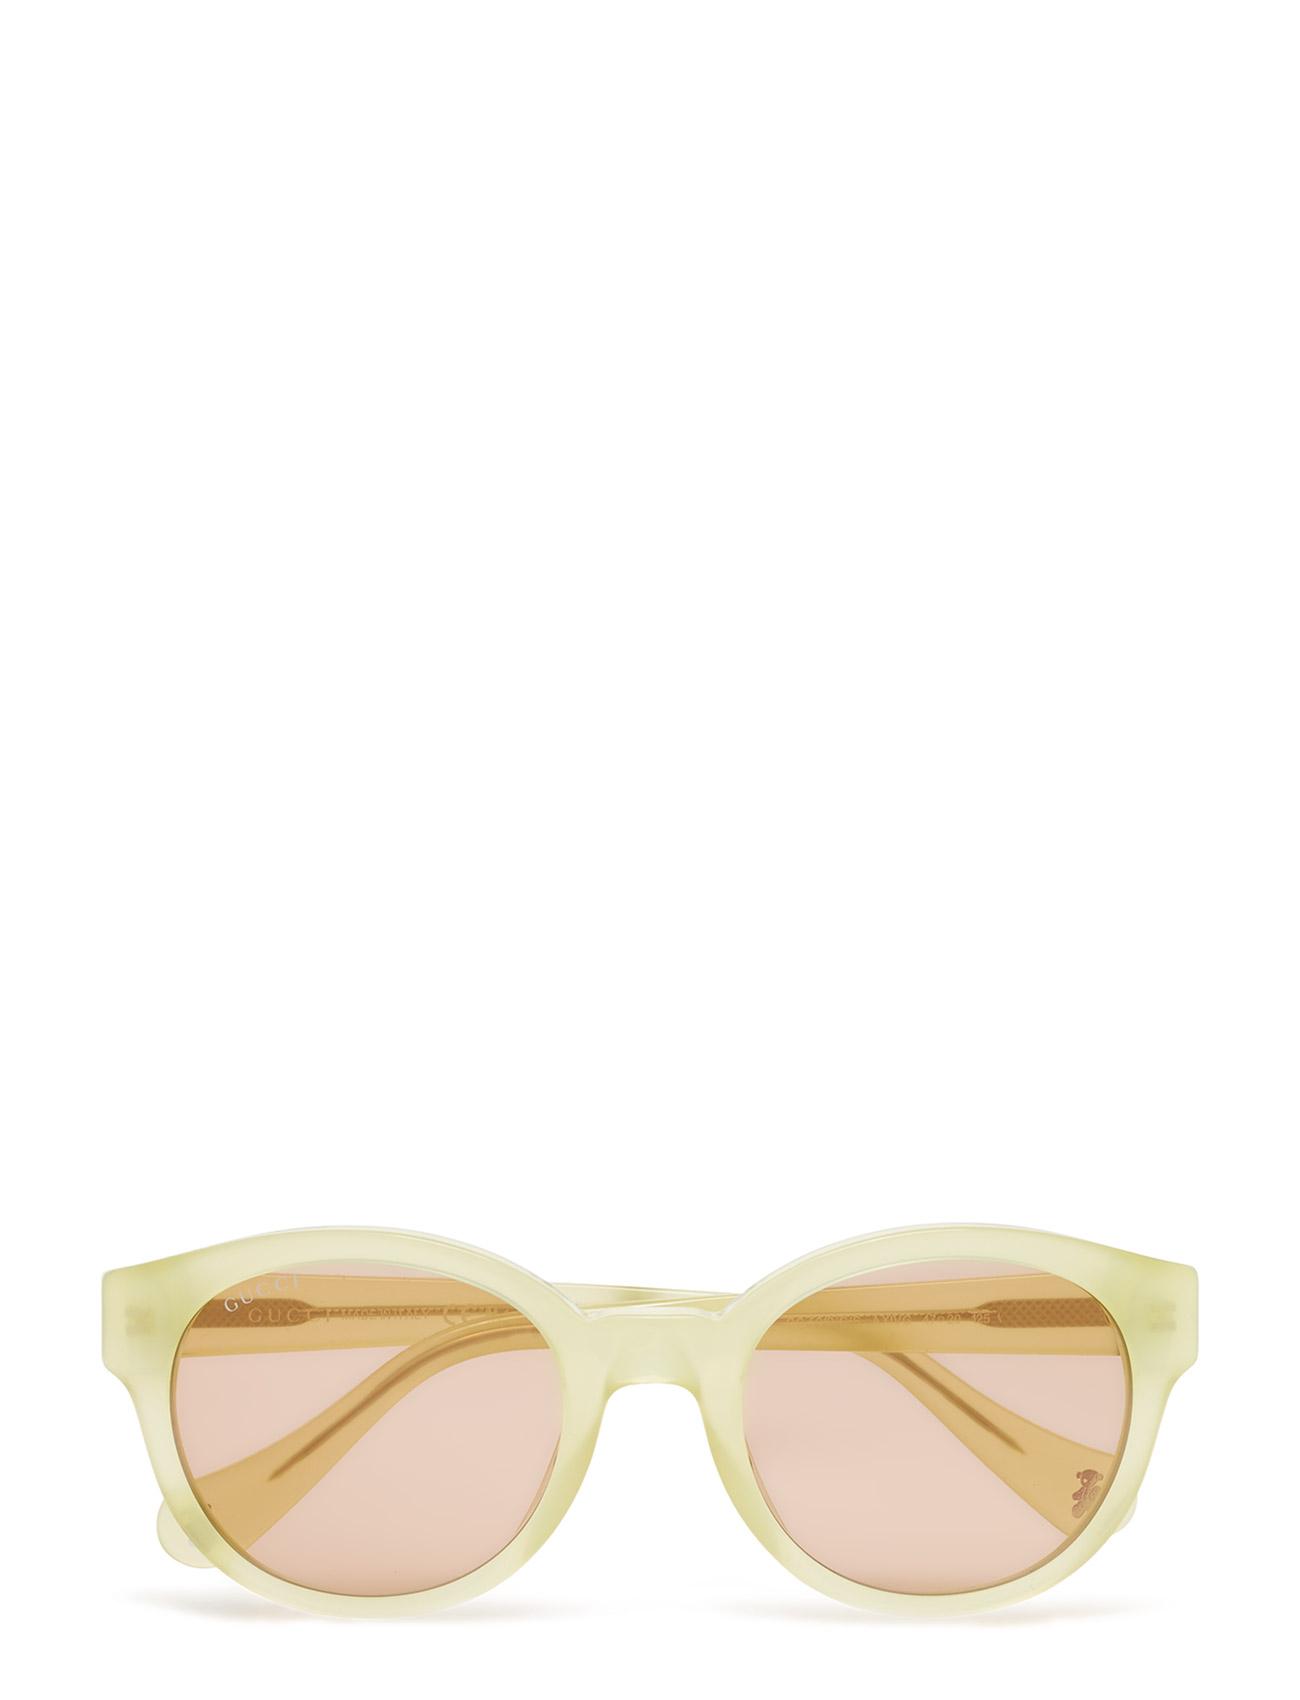 gucci sunglasses Gg5010/c/s på boozt.com dk